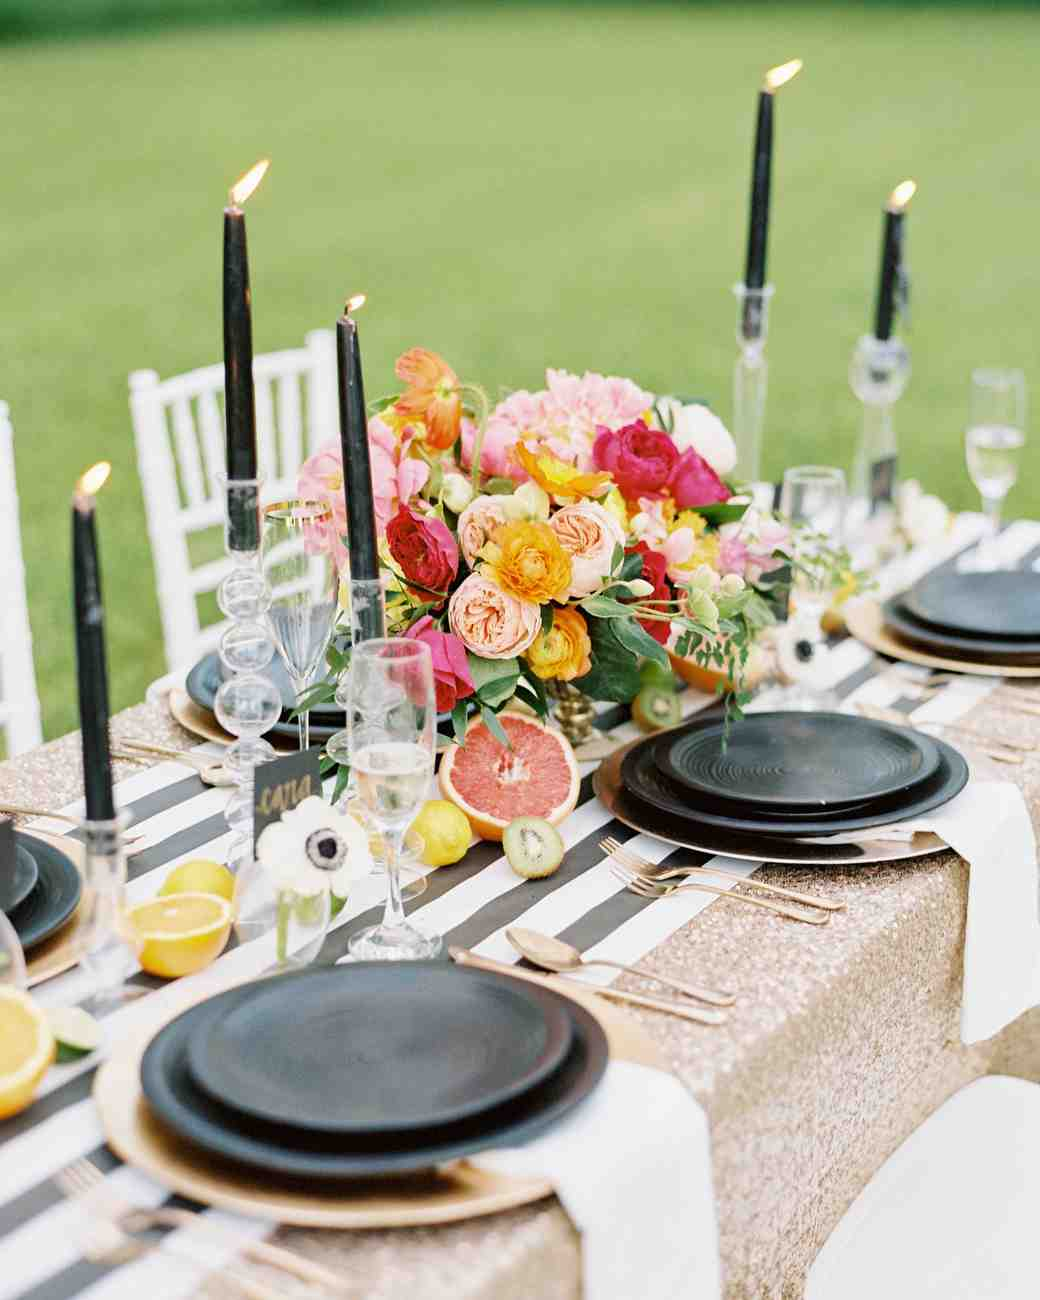 modern wedding centerpieces martha stewart weddings rh marthastewartweddings com